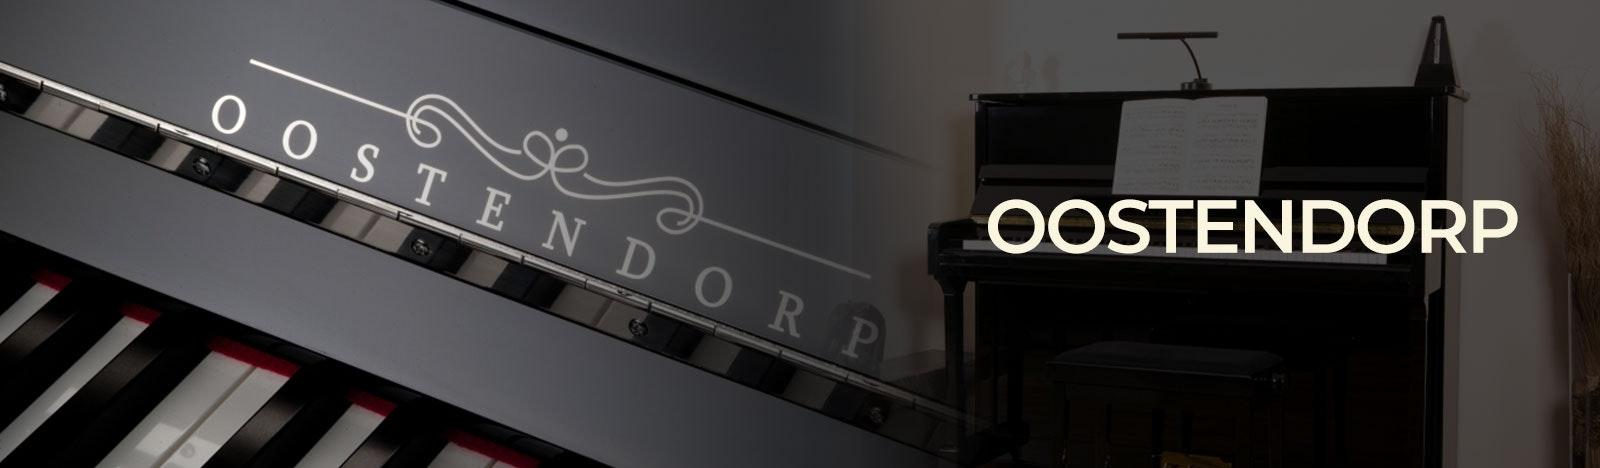 Oostendorp Digital Classic piano